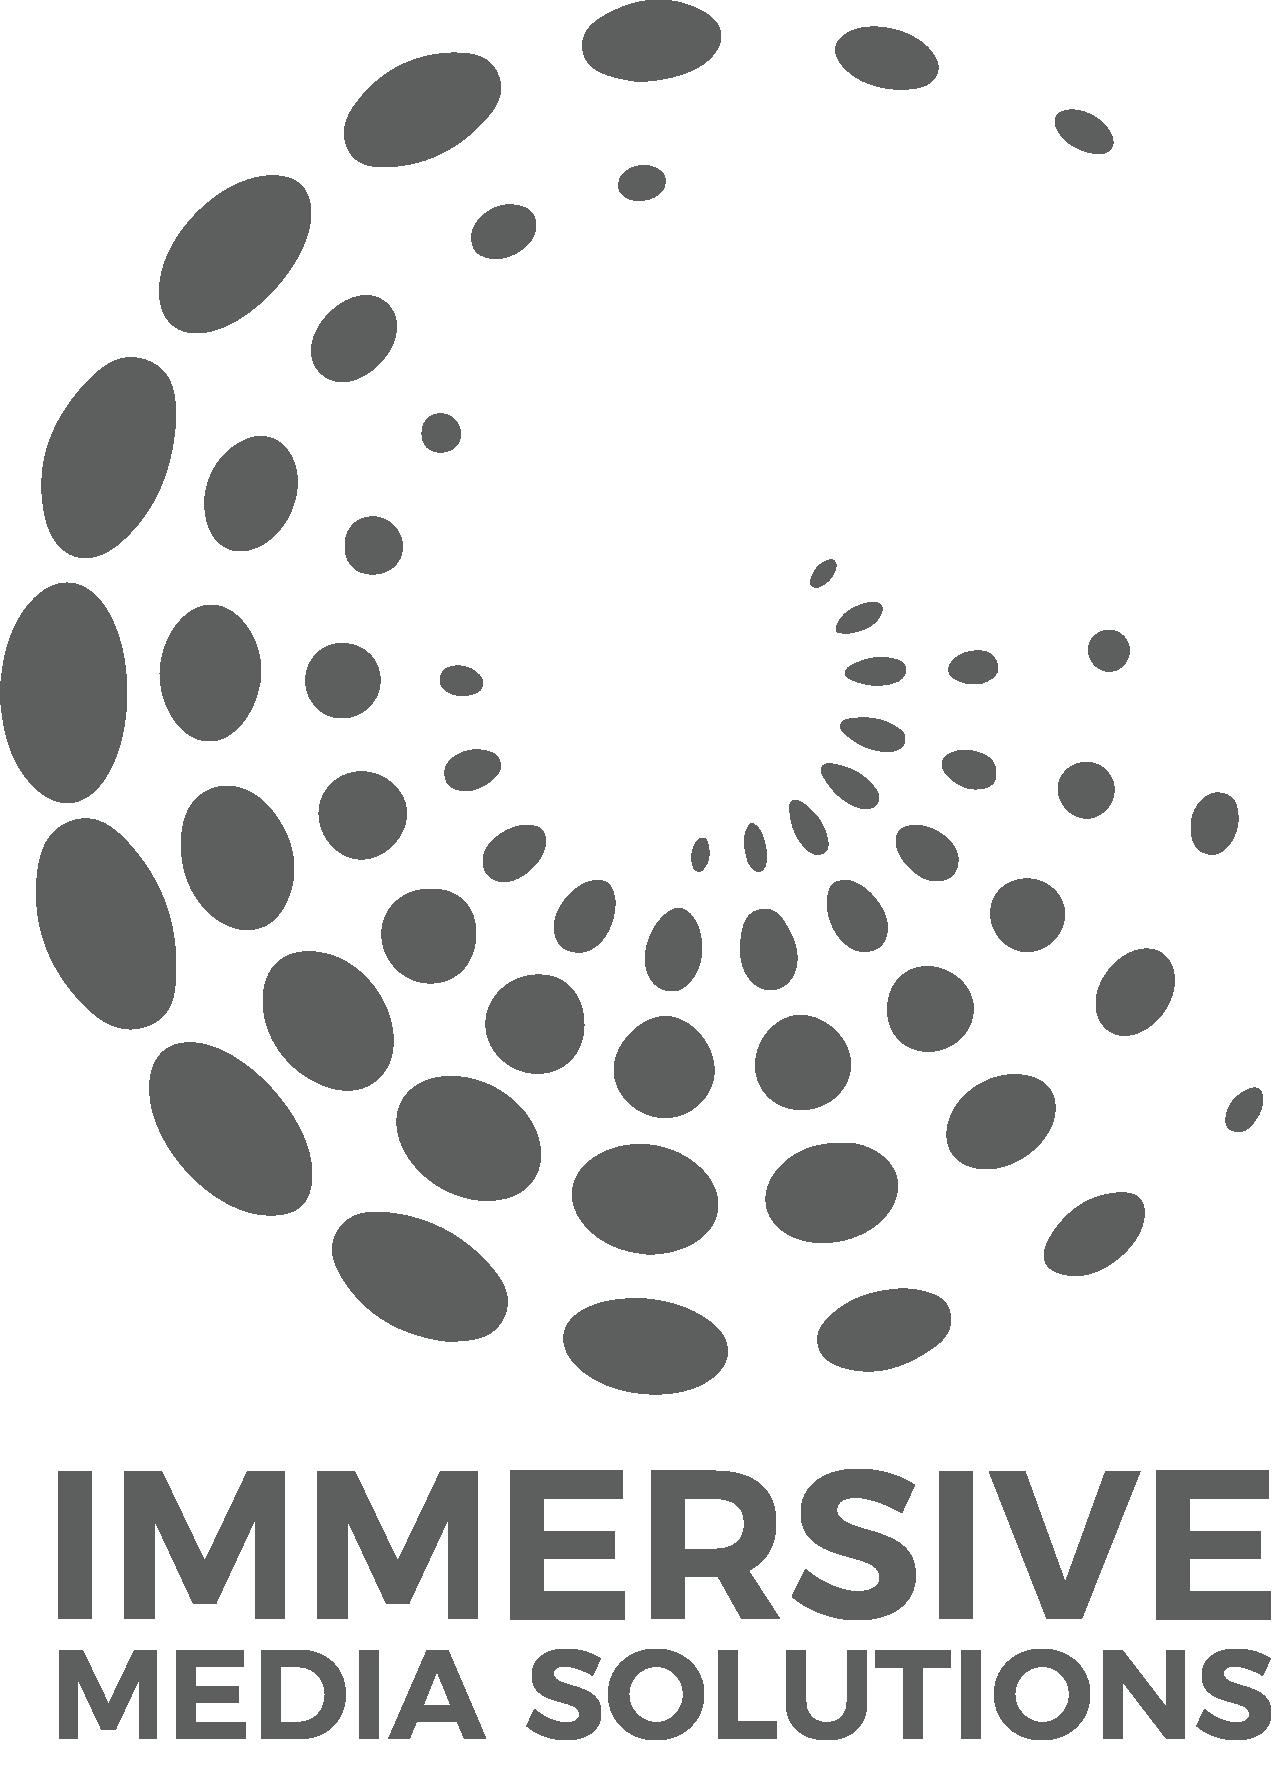 Immersive Media Solutions floor plan in Miami